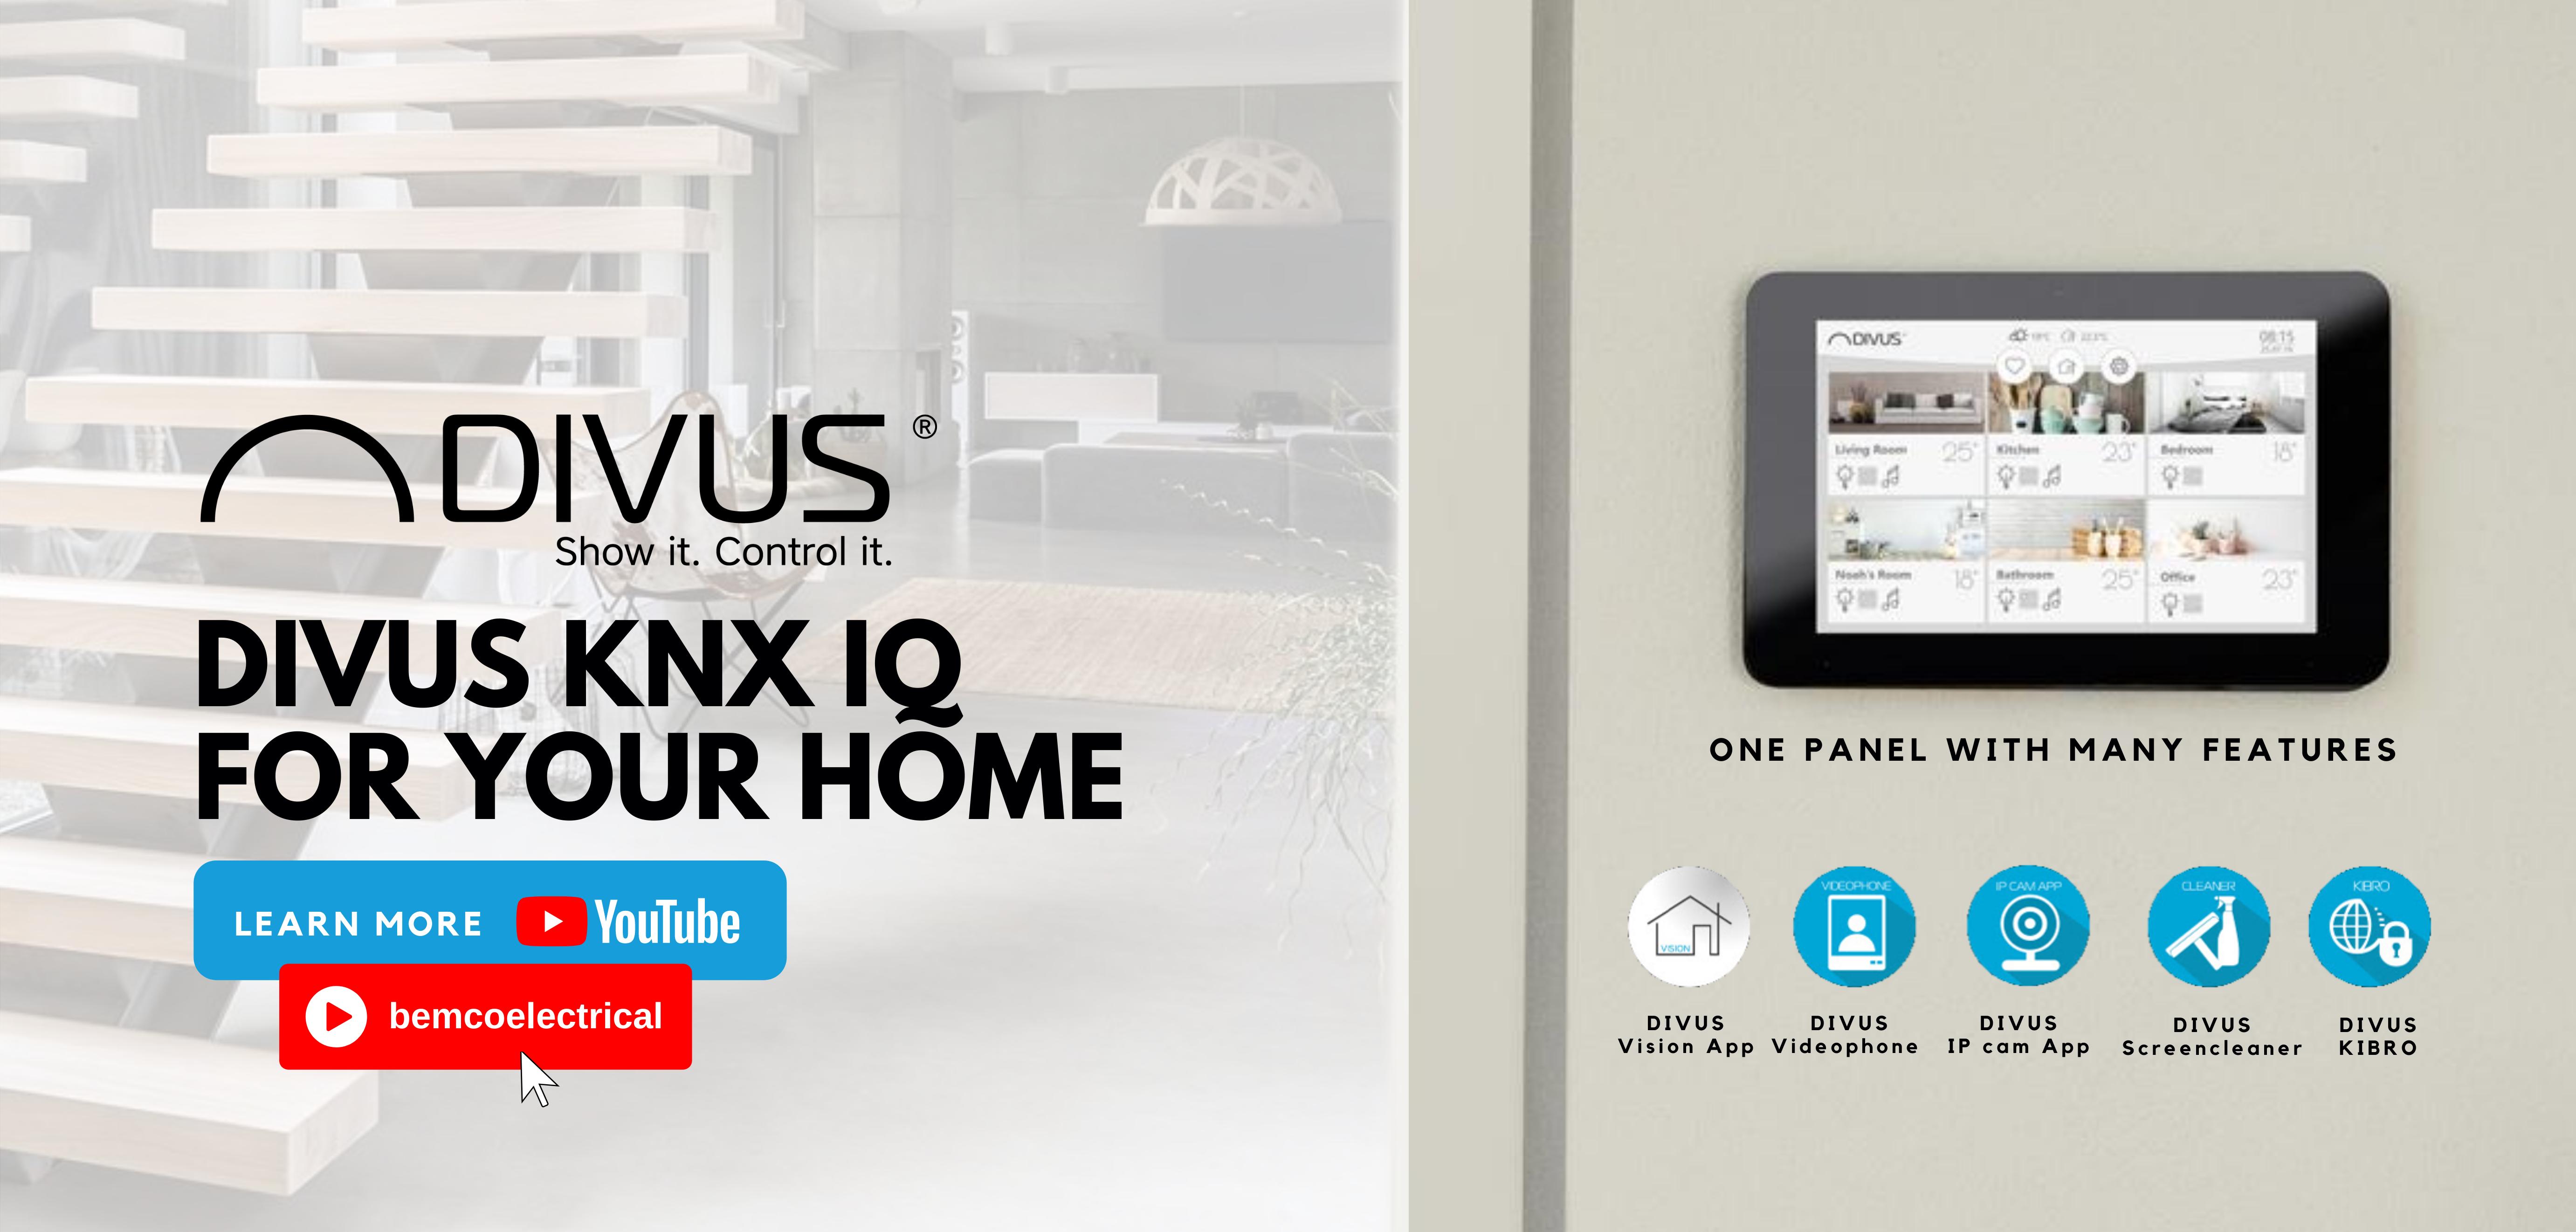 Divus KNX IQ Webinar